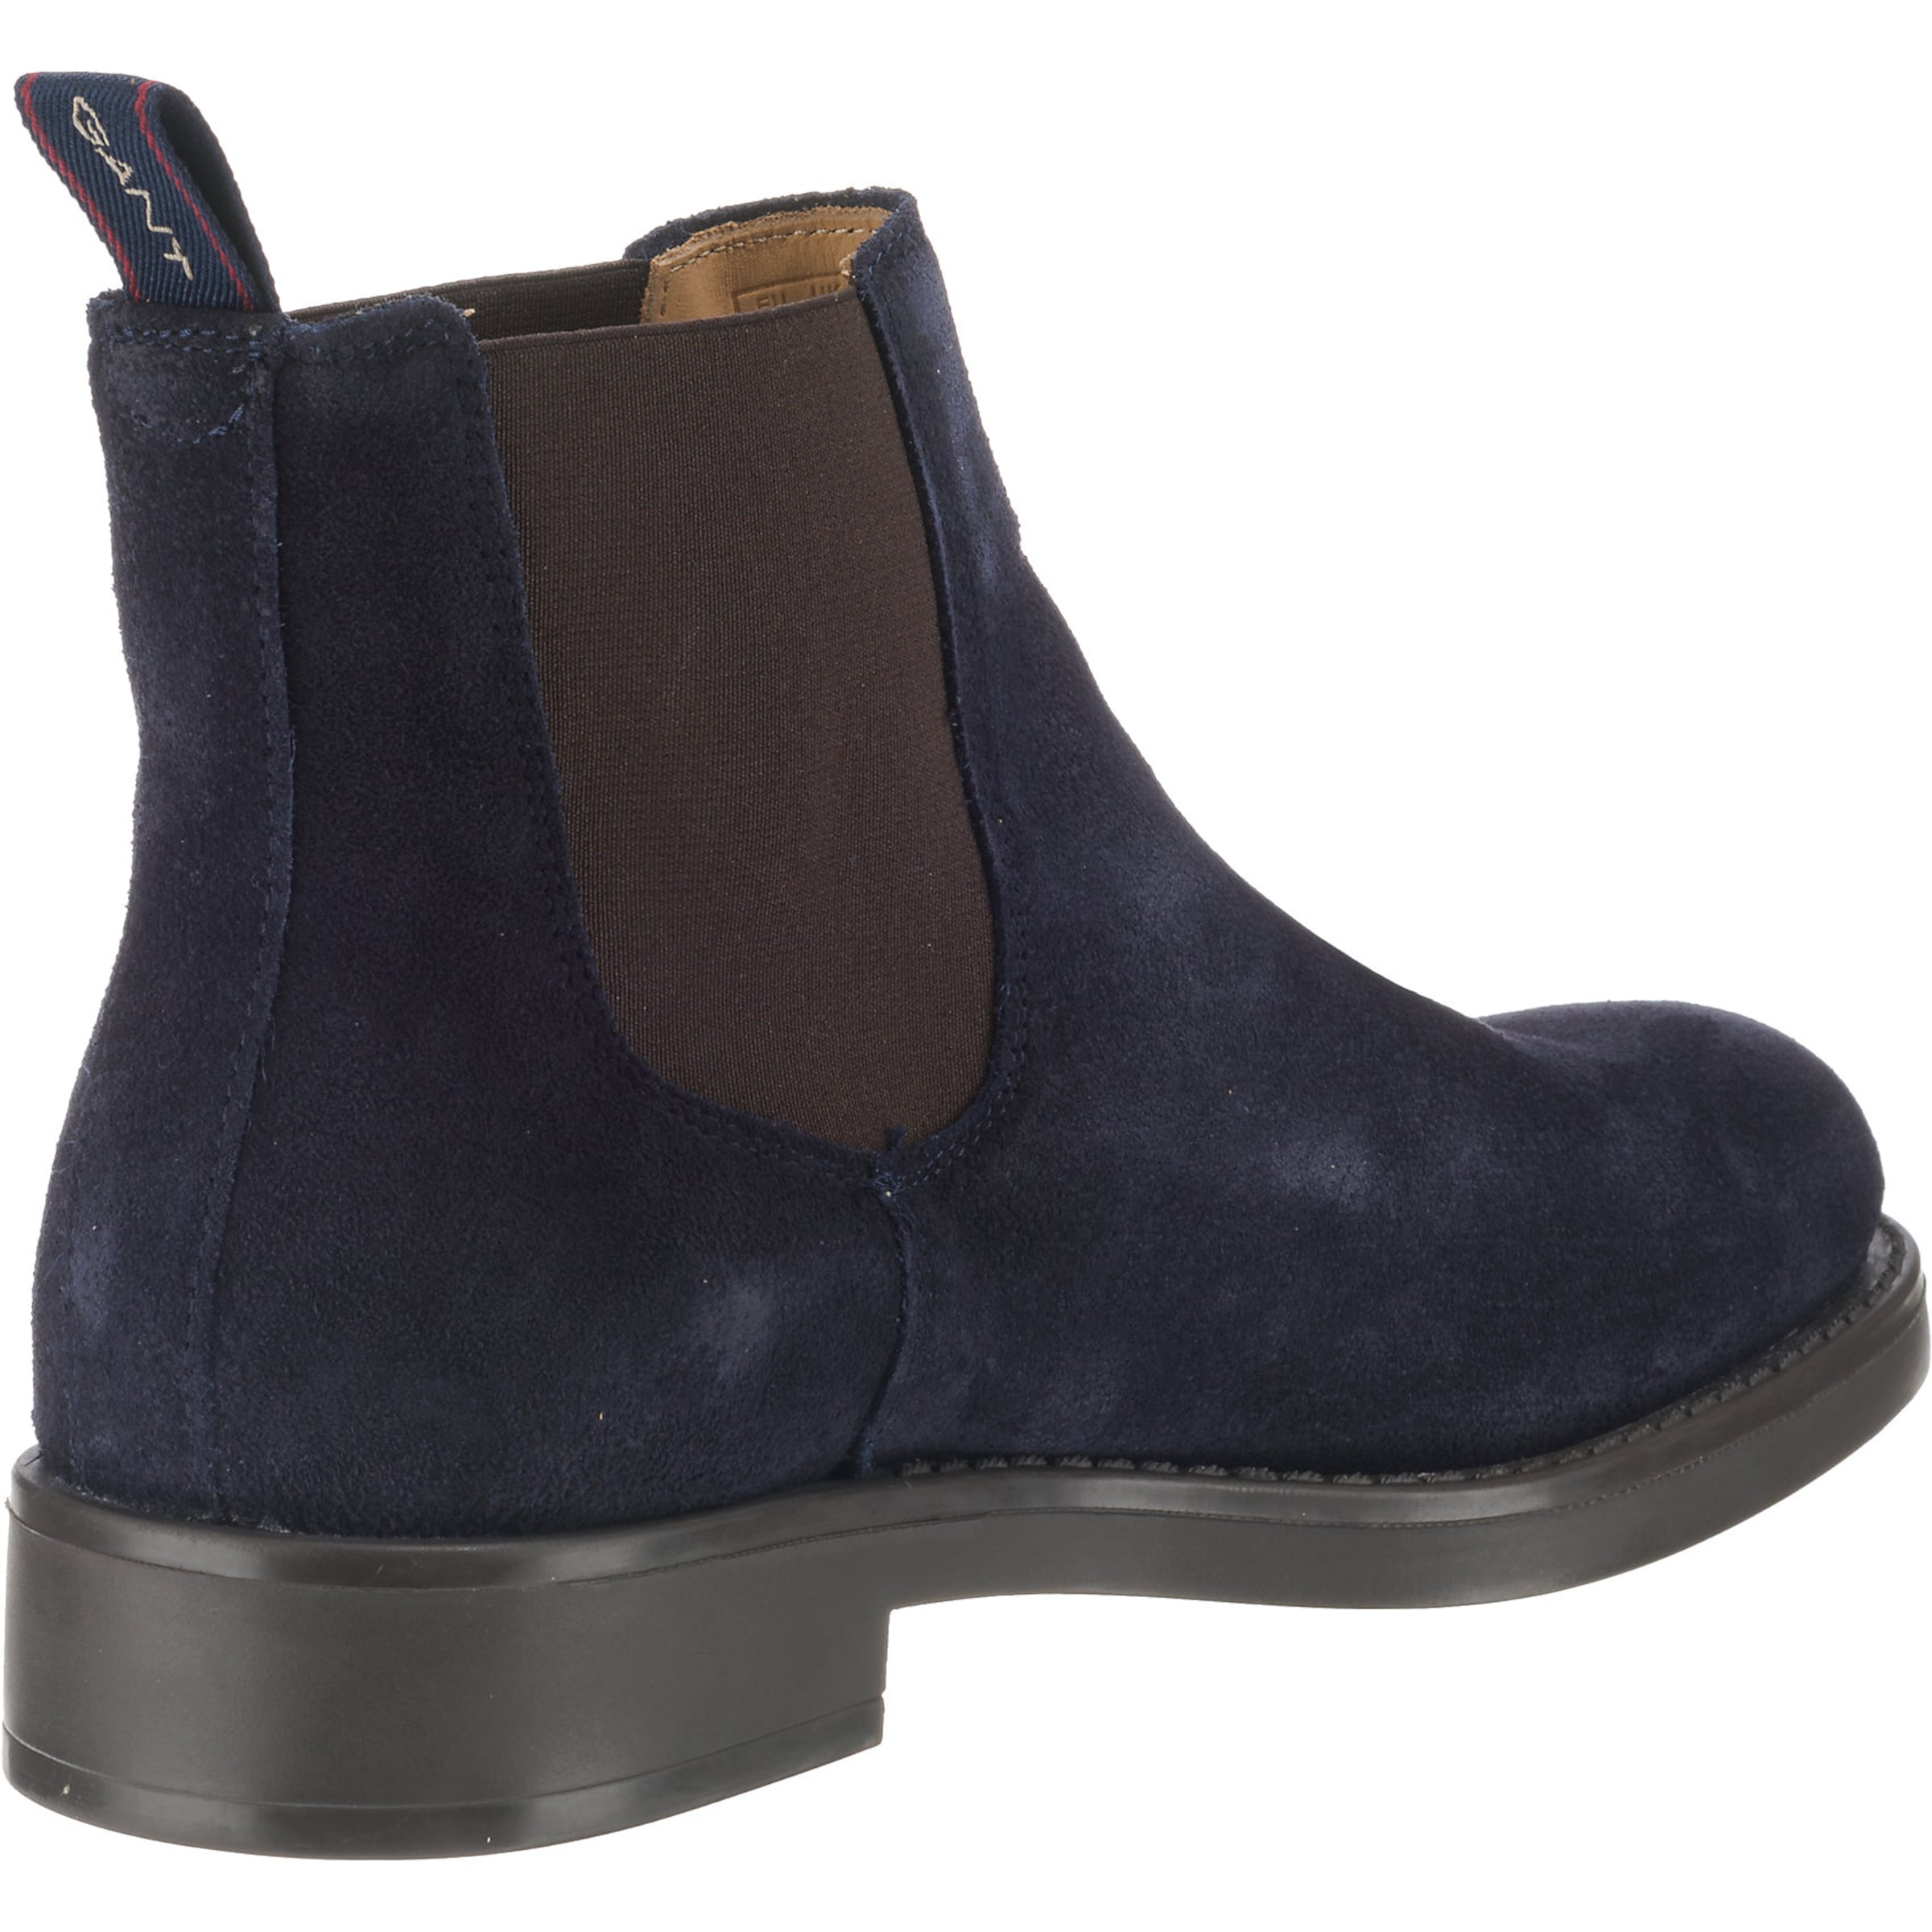 'oscar' Boots Gant DunkelblauBraun In Chelsea HWED29eIbY